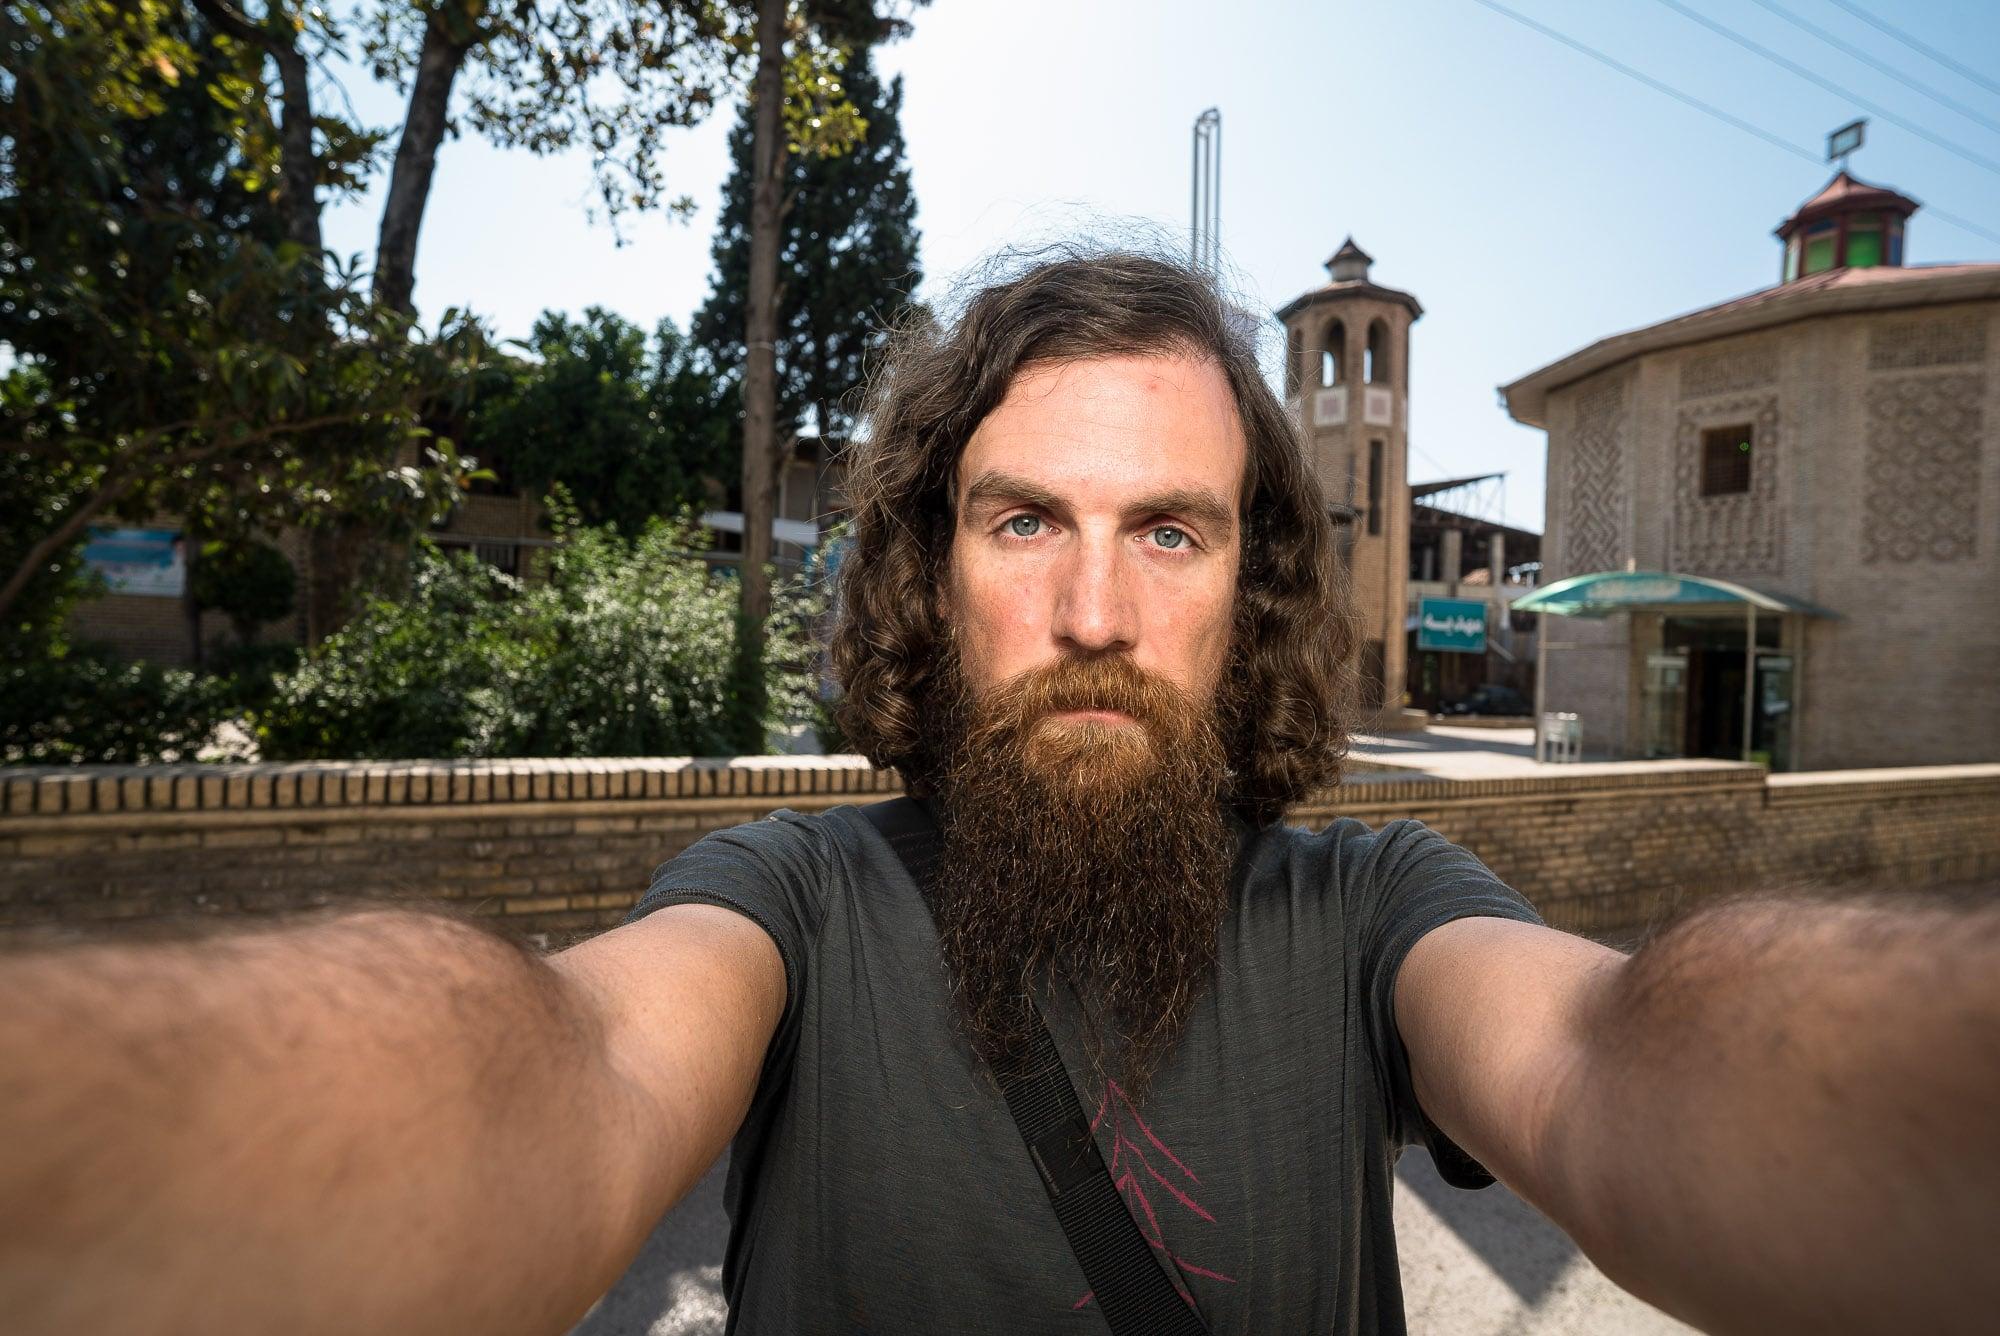 Gorgan selfie flash shade